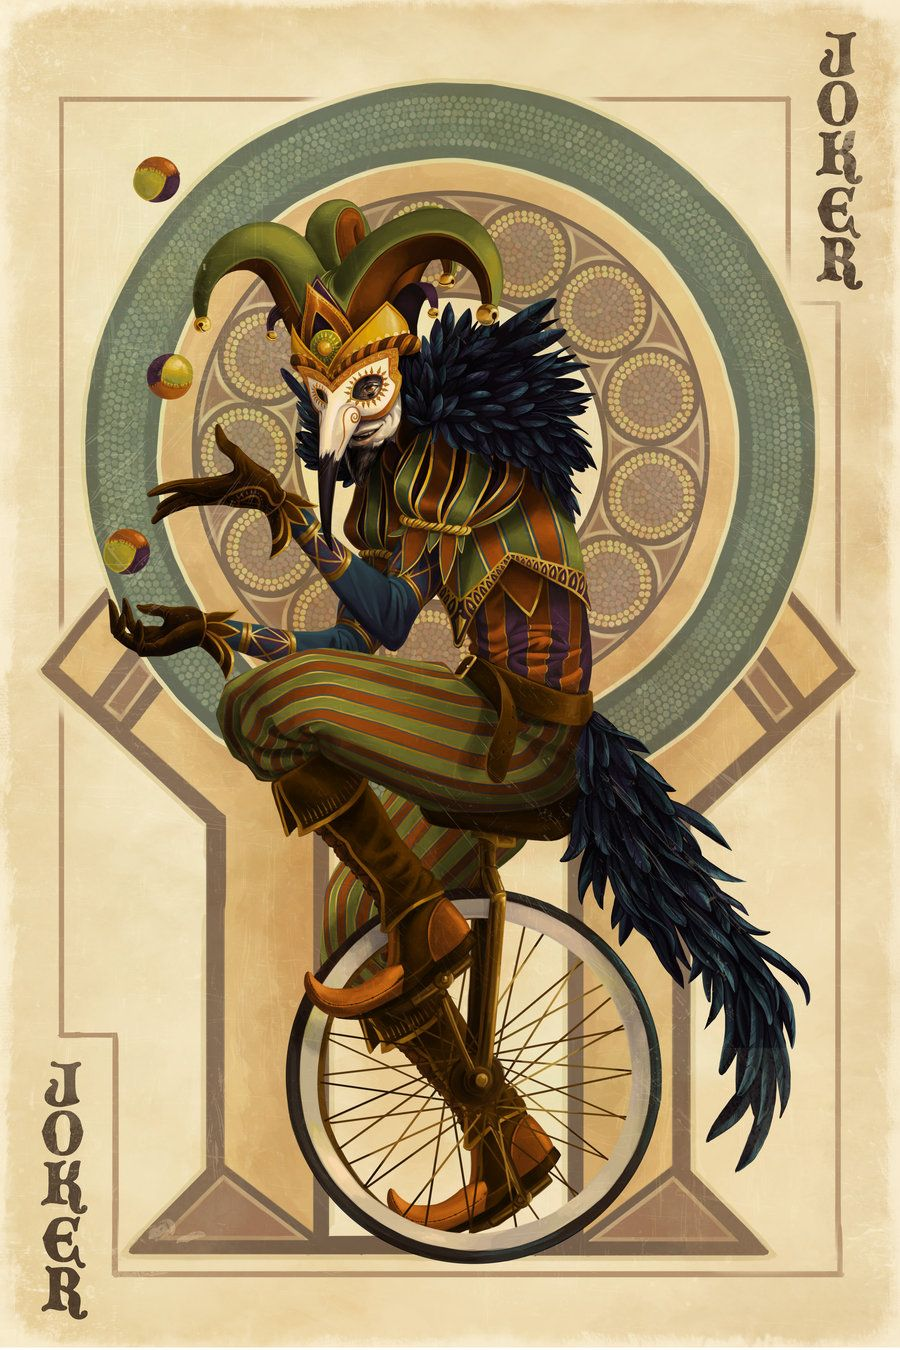 Joker Card By Chronoperates Deviantart Com Piel Shoppiel